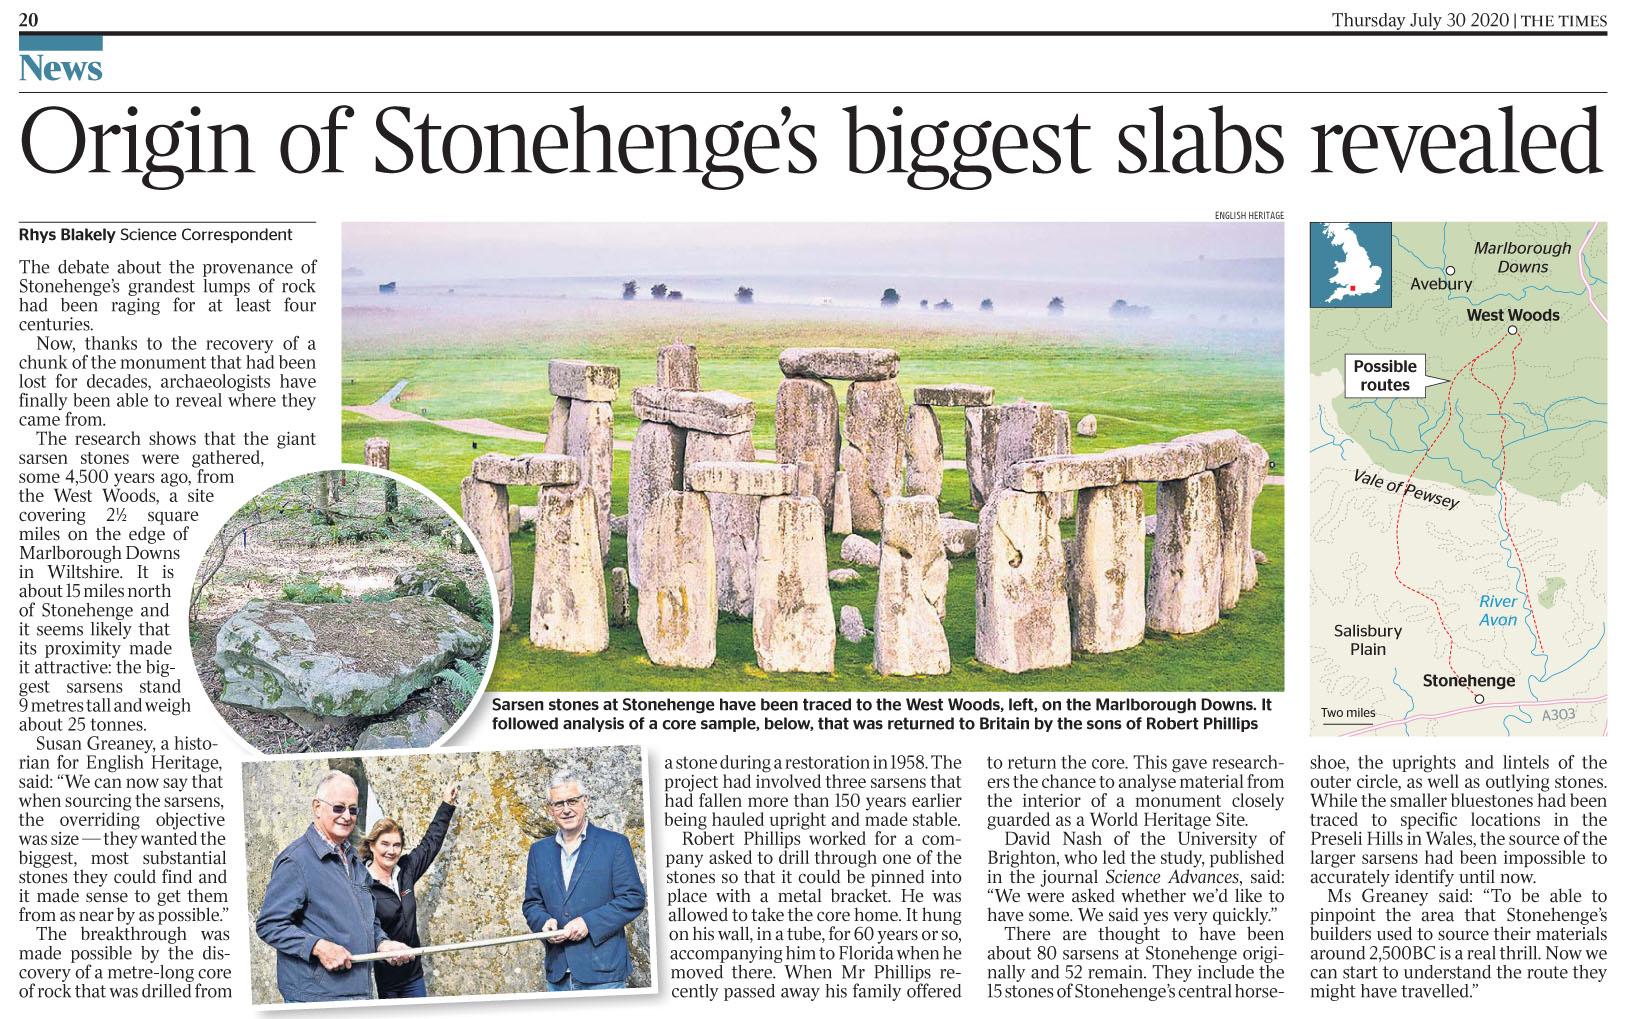 Times 200730 Stonehenge.jpg